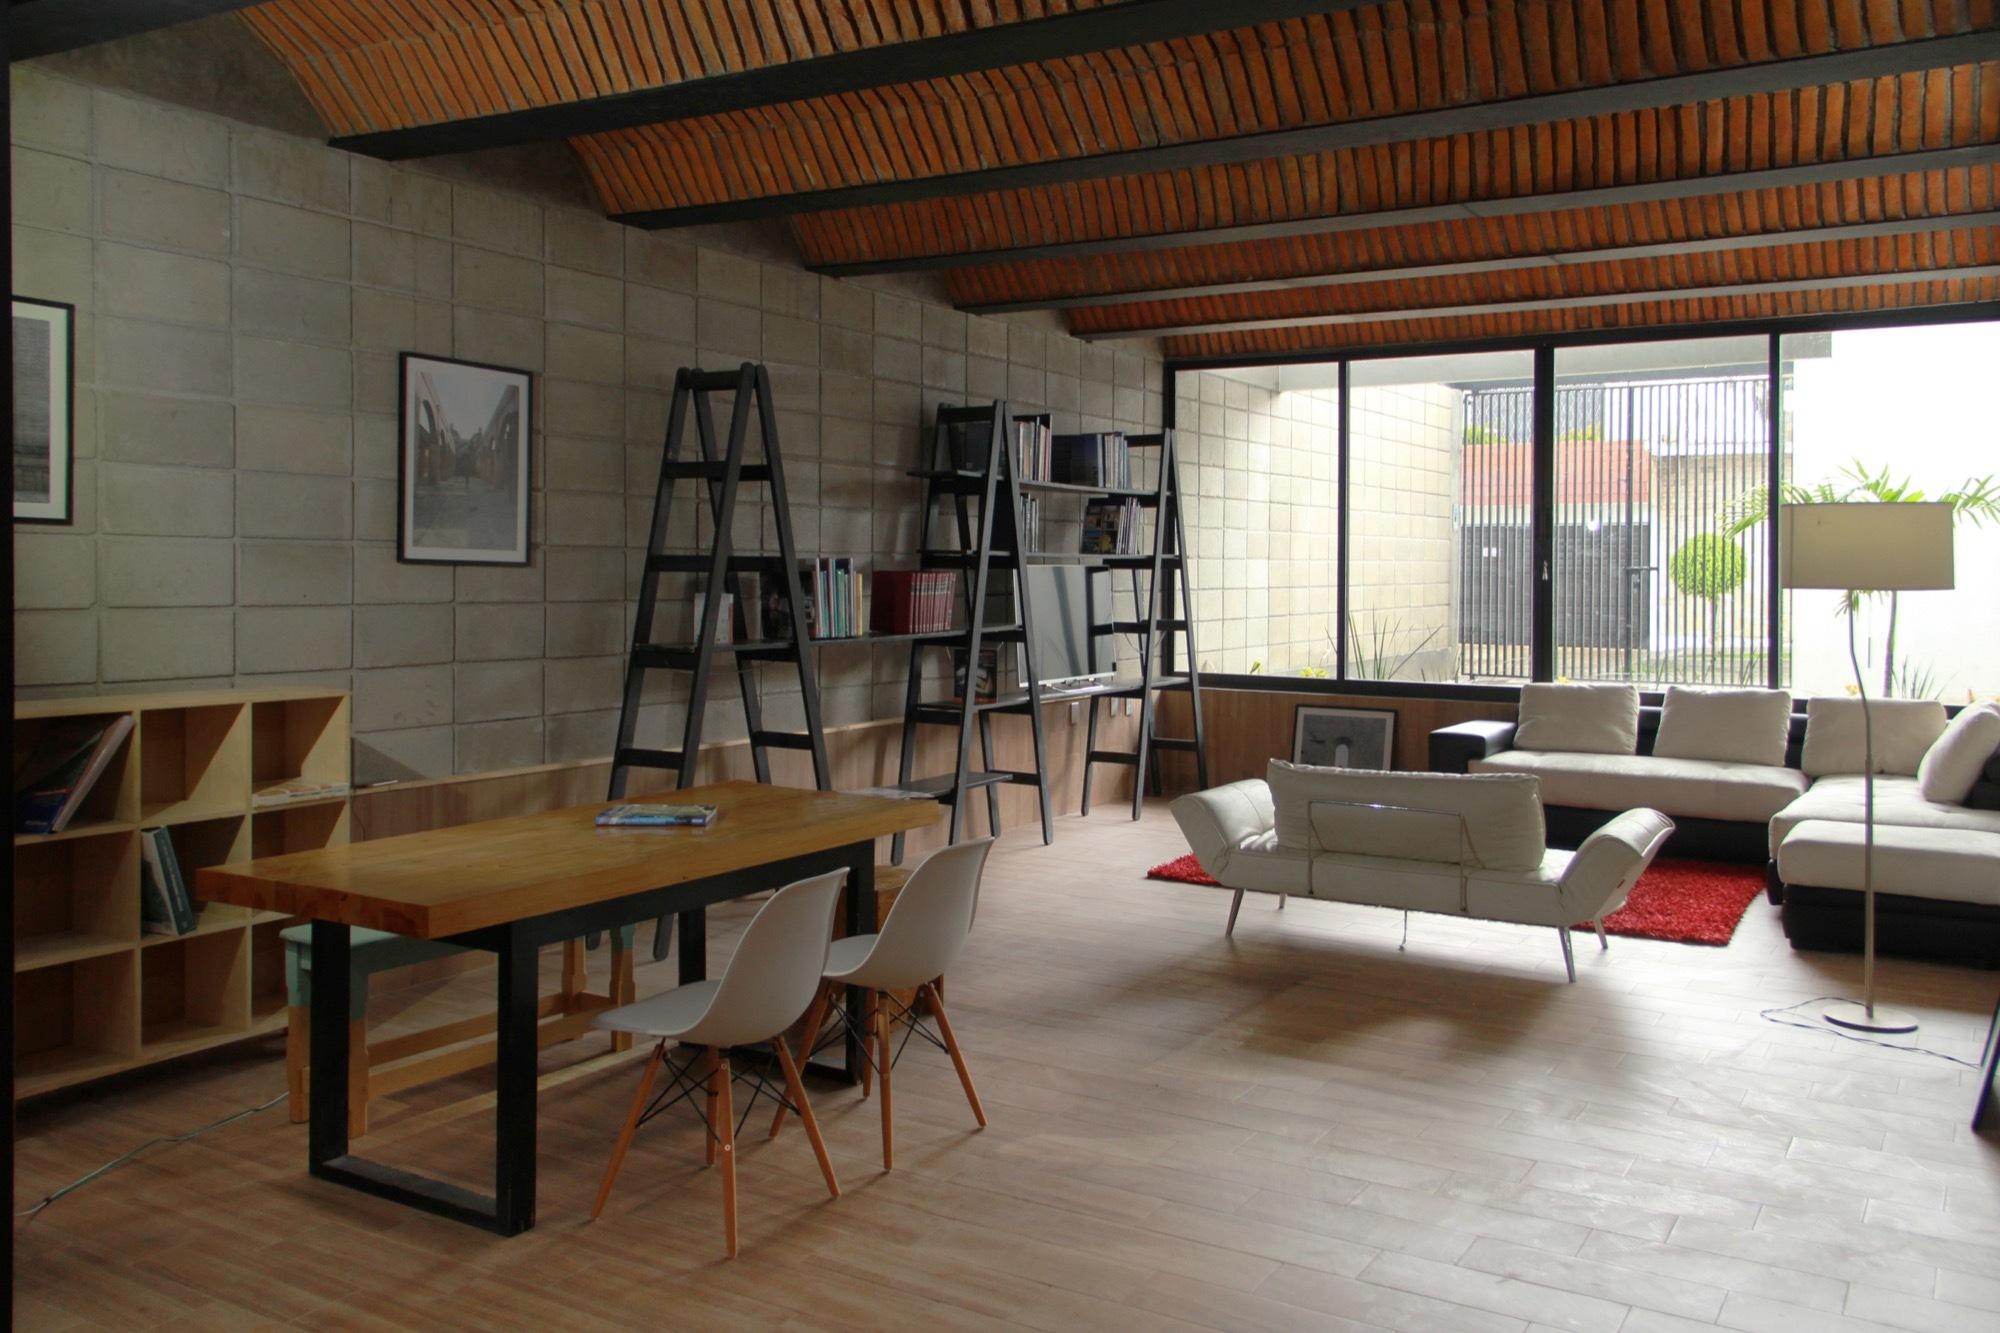 Galer a de casa jard n apaloosa estudio de arquitectura - Estudios de arquitectura en cordoba ...